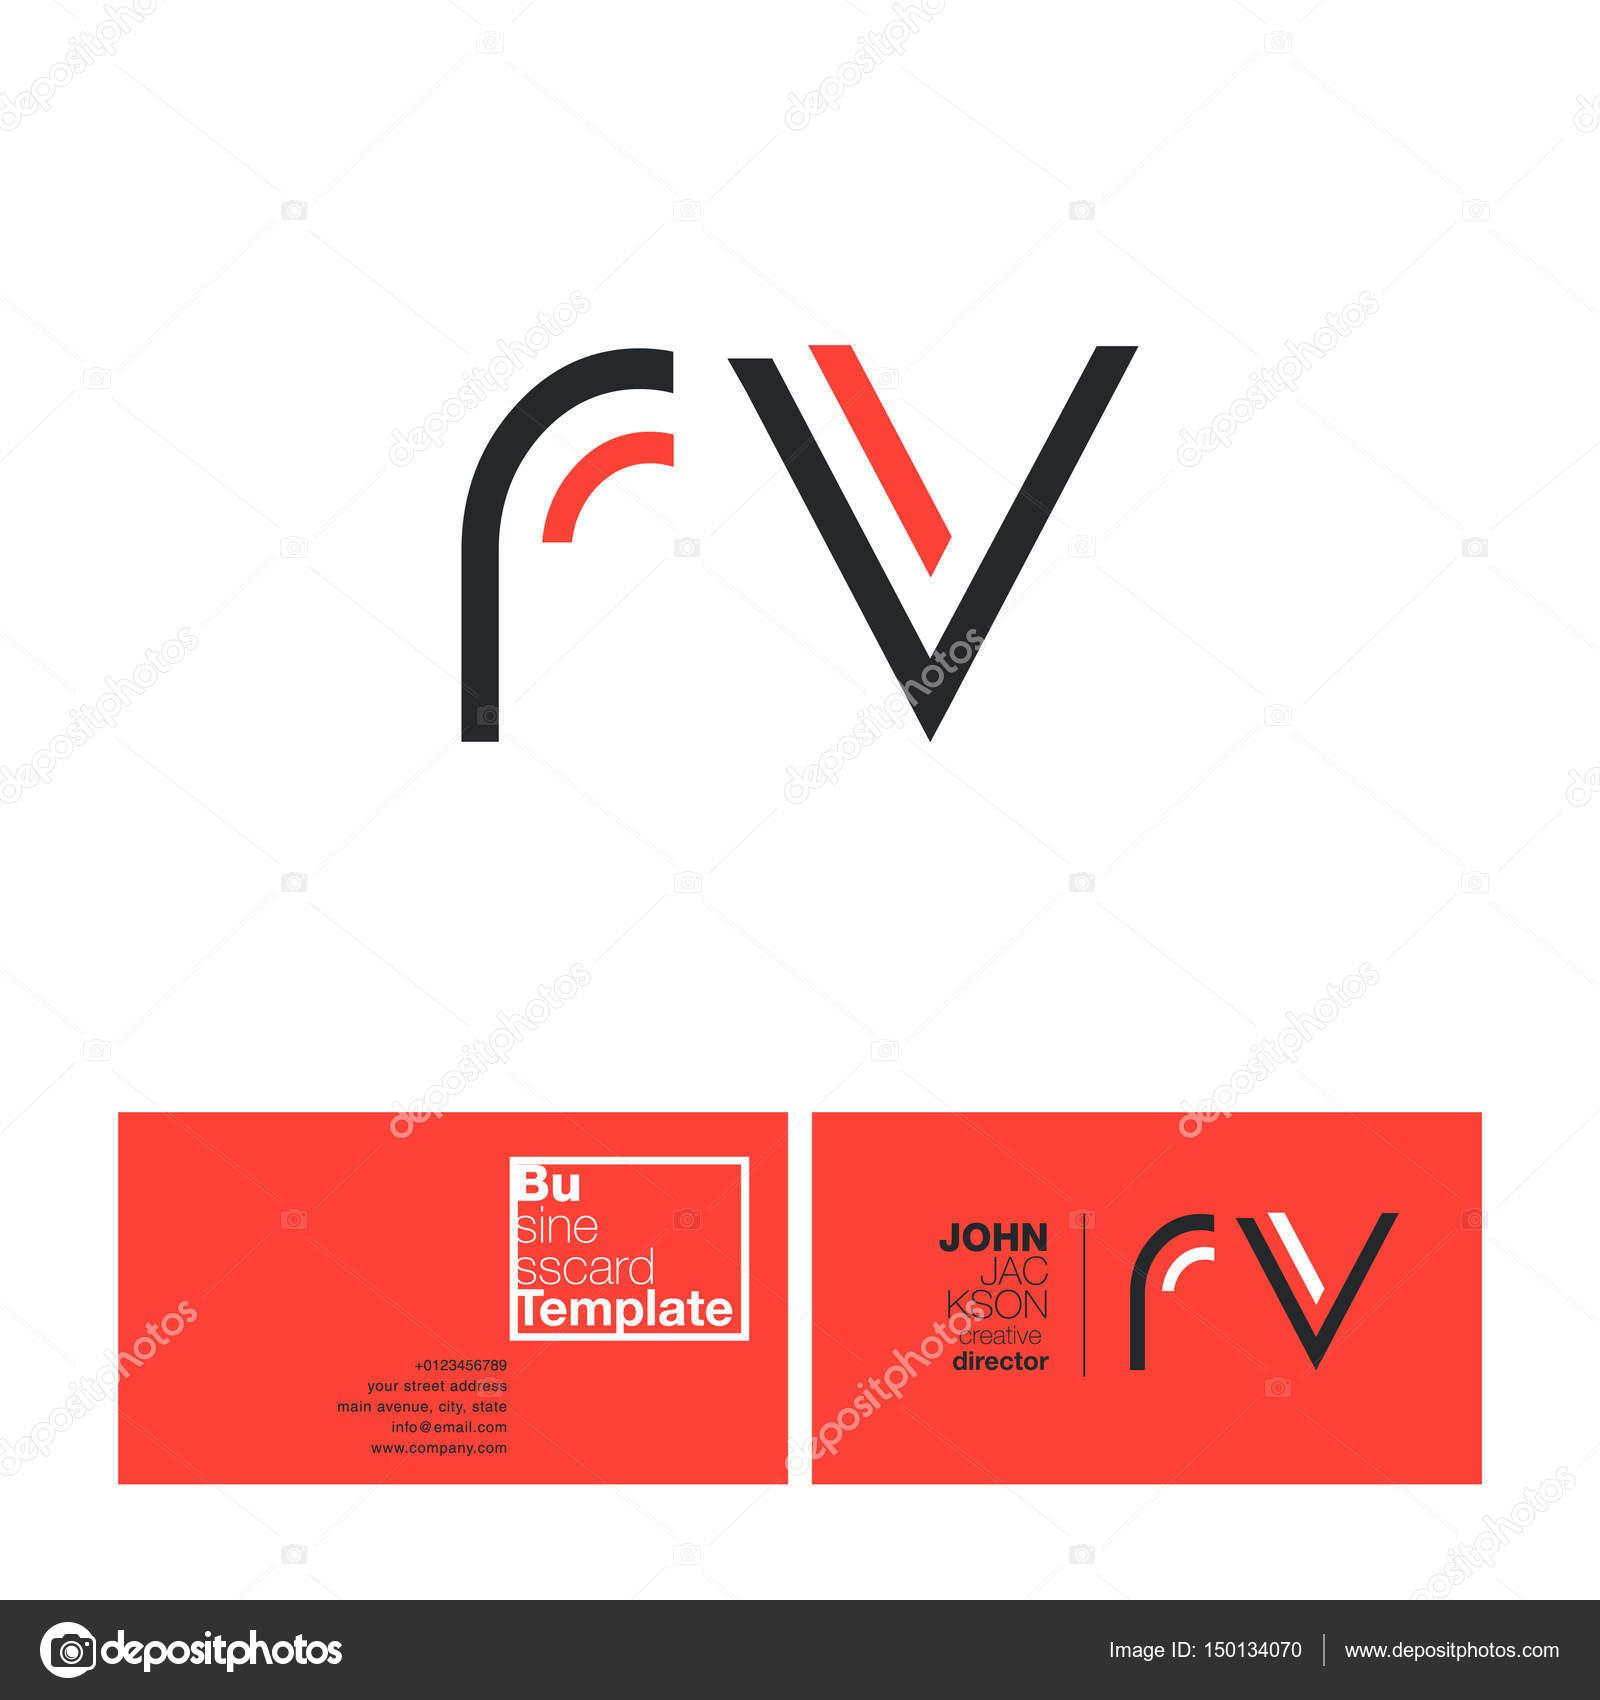 Rv letters logo business card stock vector brainbistro 150134070 rv letters logo business card stock vector colourmoves